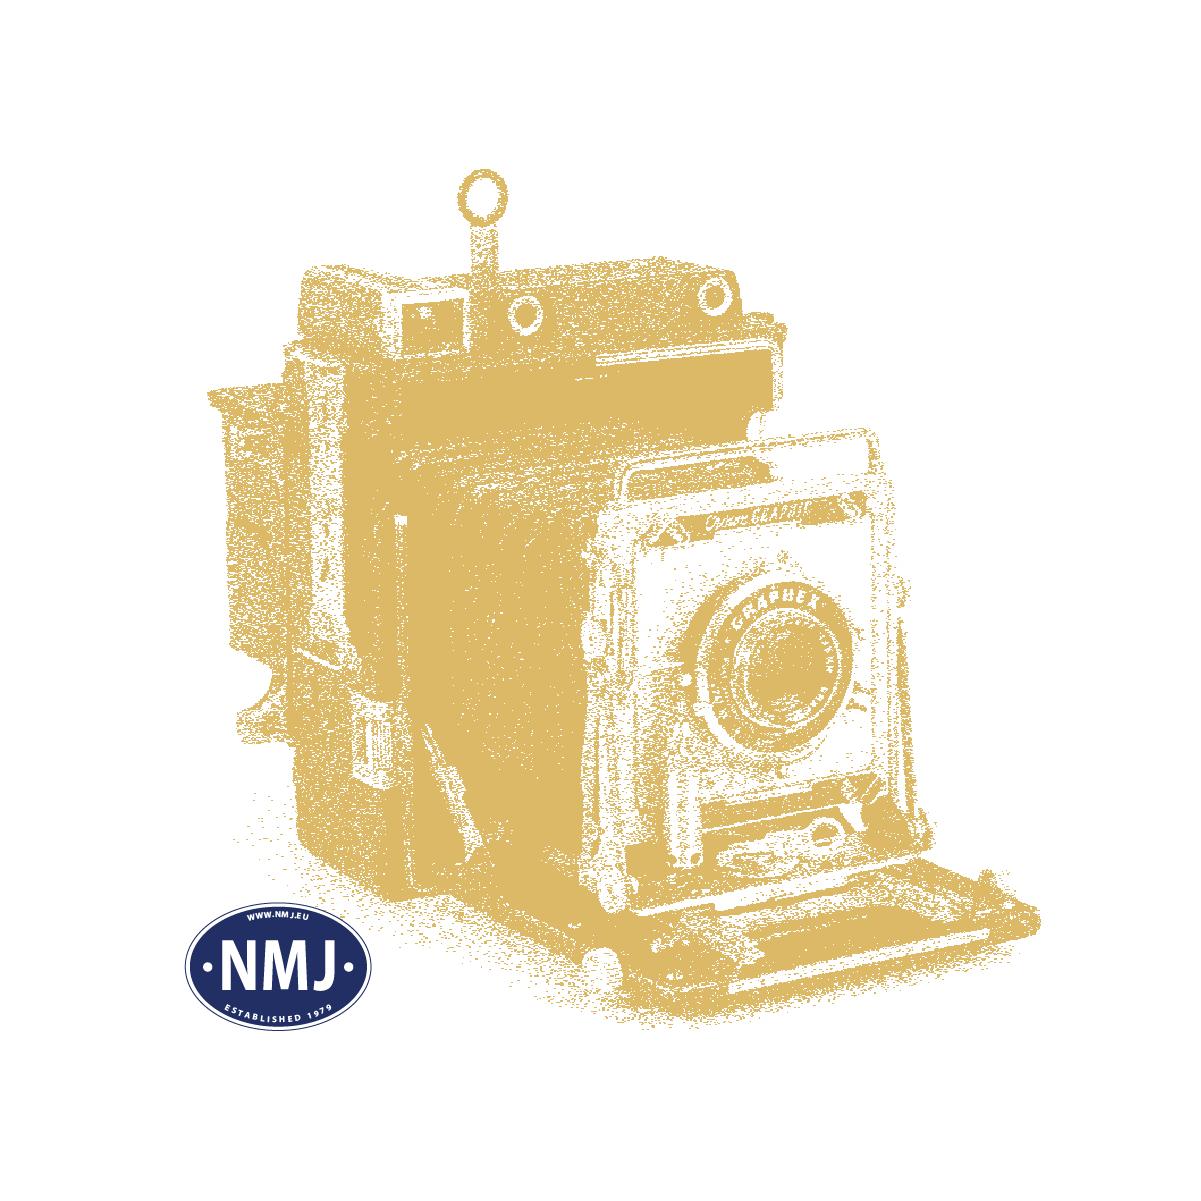 NMJ Topline NSB SKD224.223, Rødbrun, DCC Digital